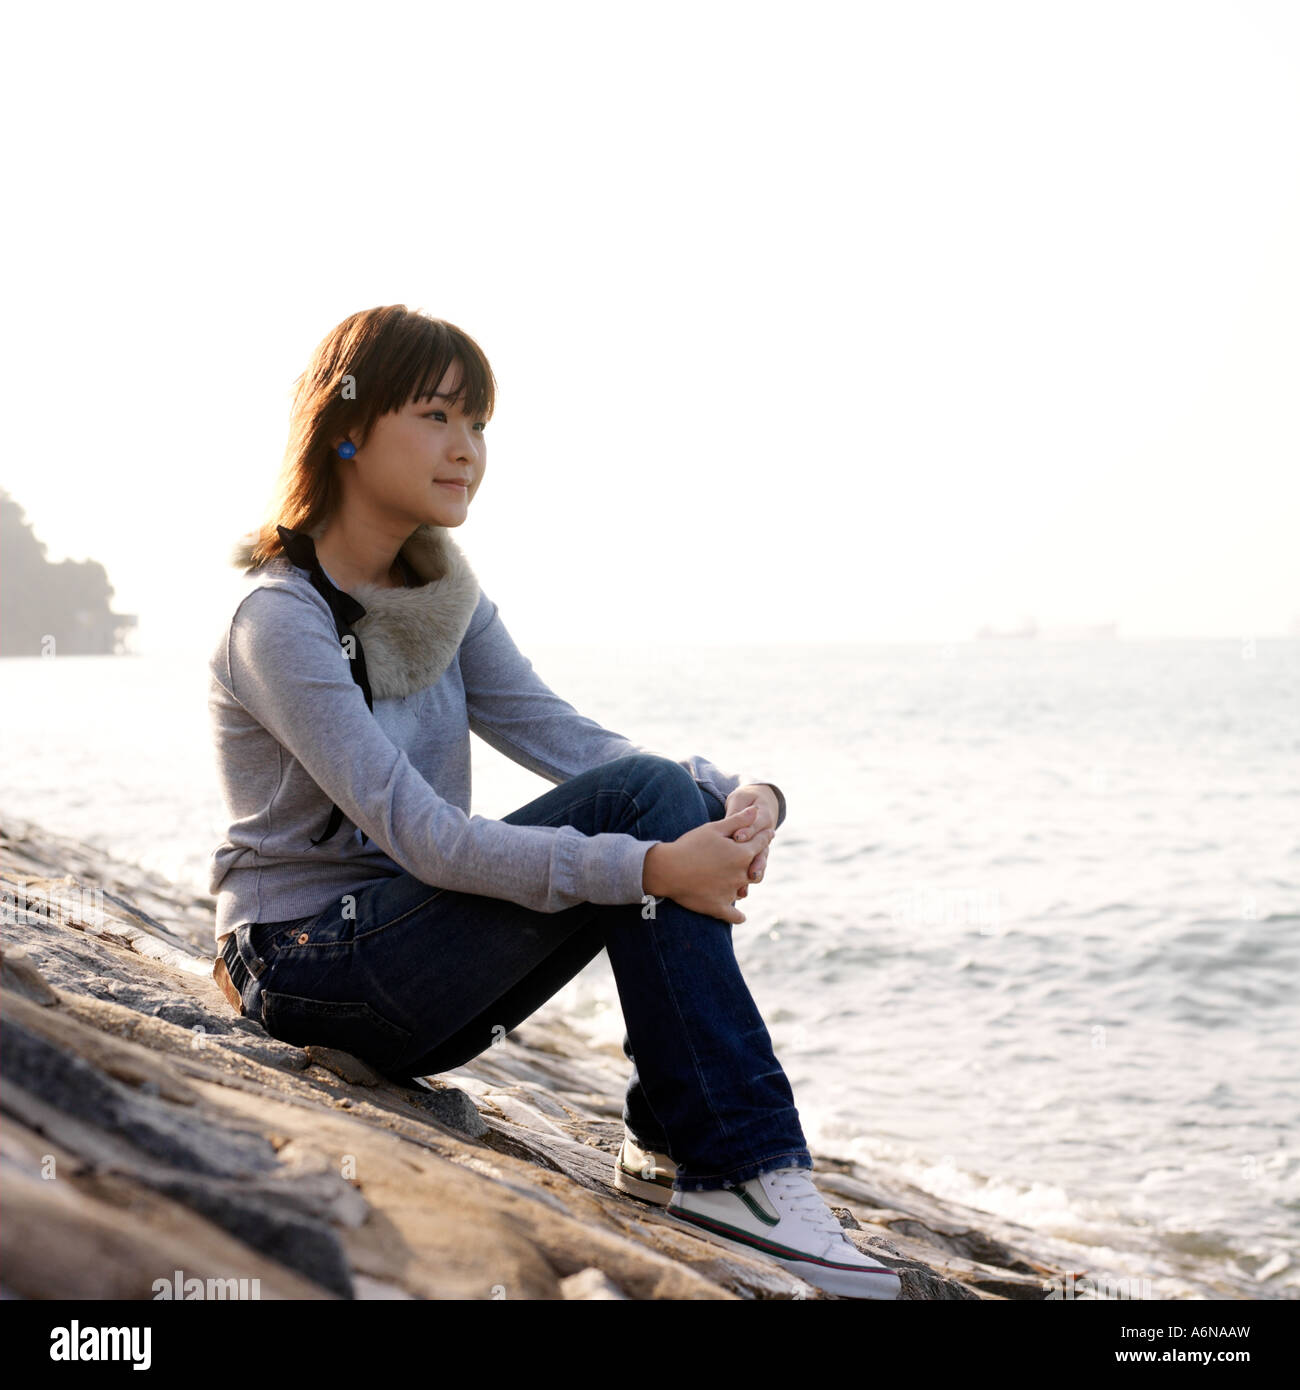 Girl sitting on rocks facing ocean - Stock Image